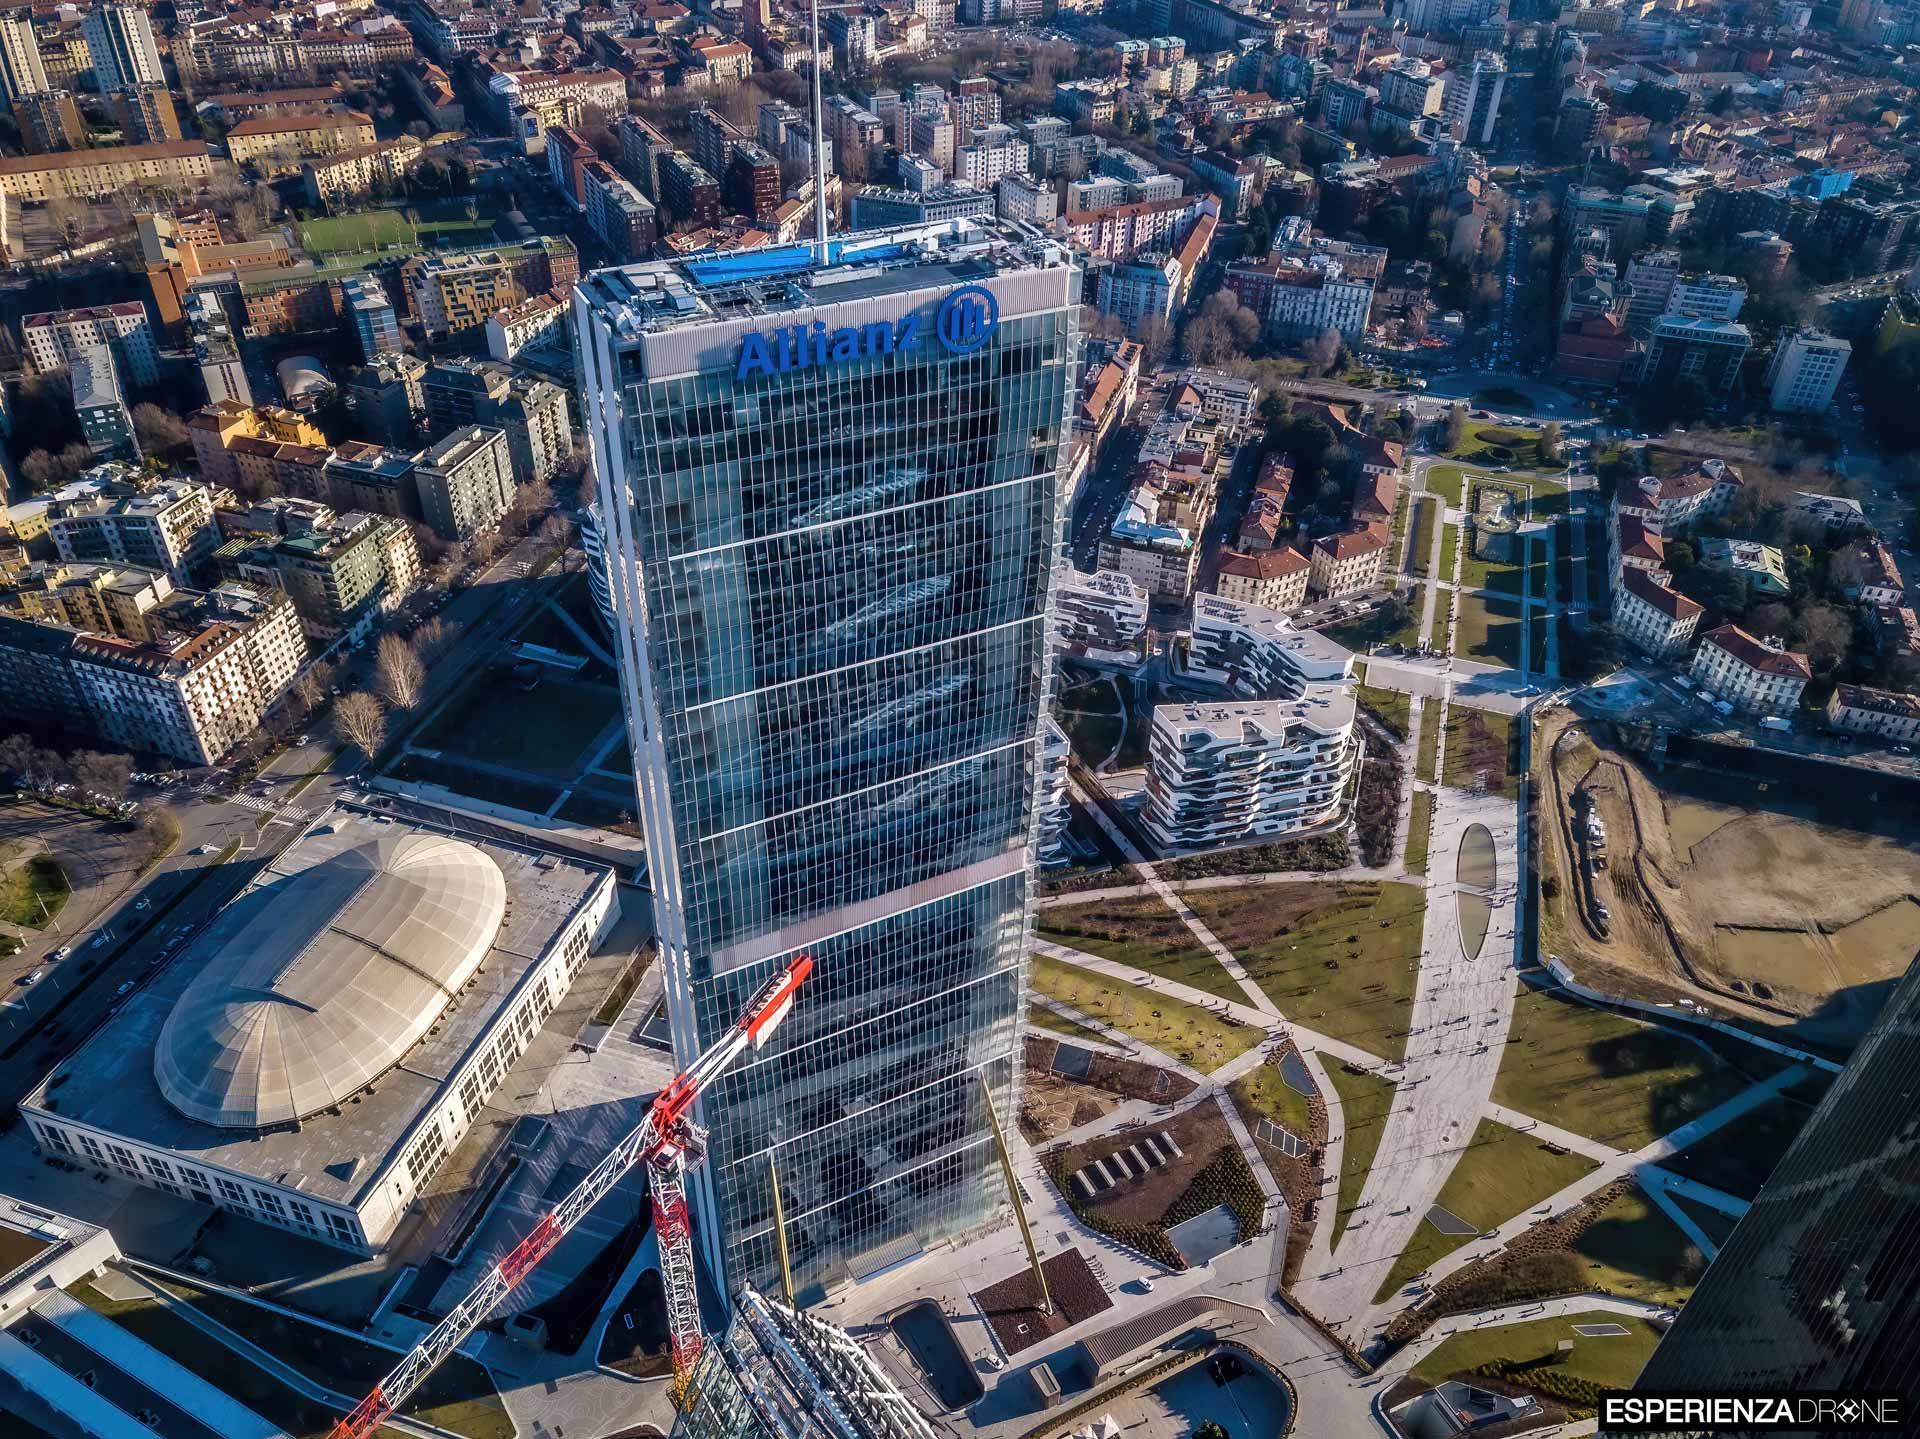 esperienza drone fotografia aerea costruzione torri citylife milano nove.jpg